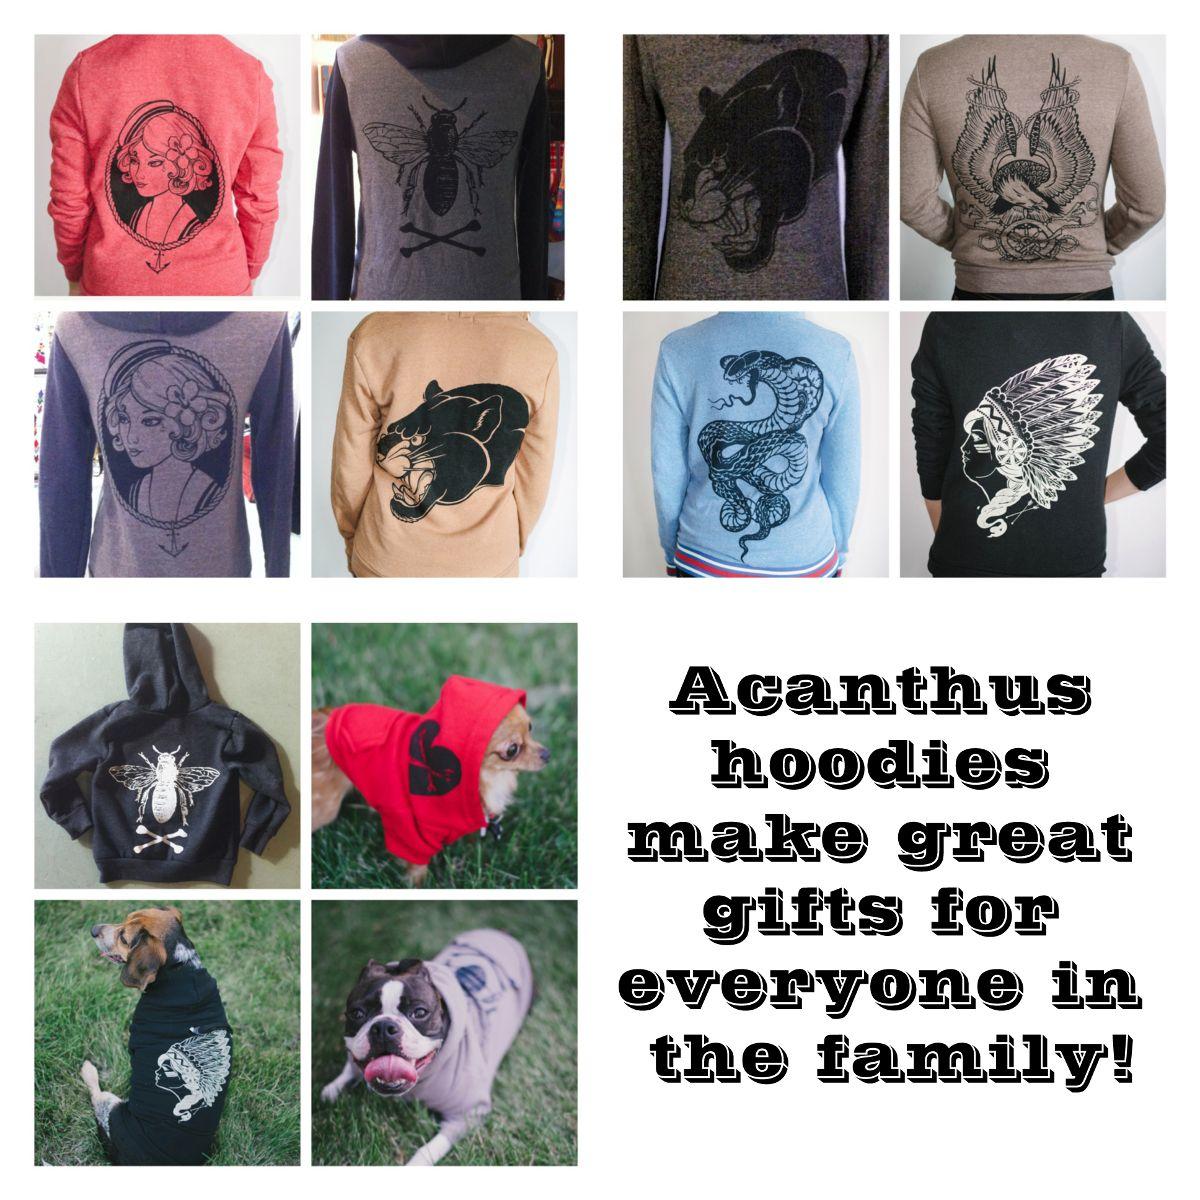 Acanthus hoodies